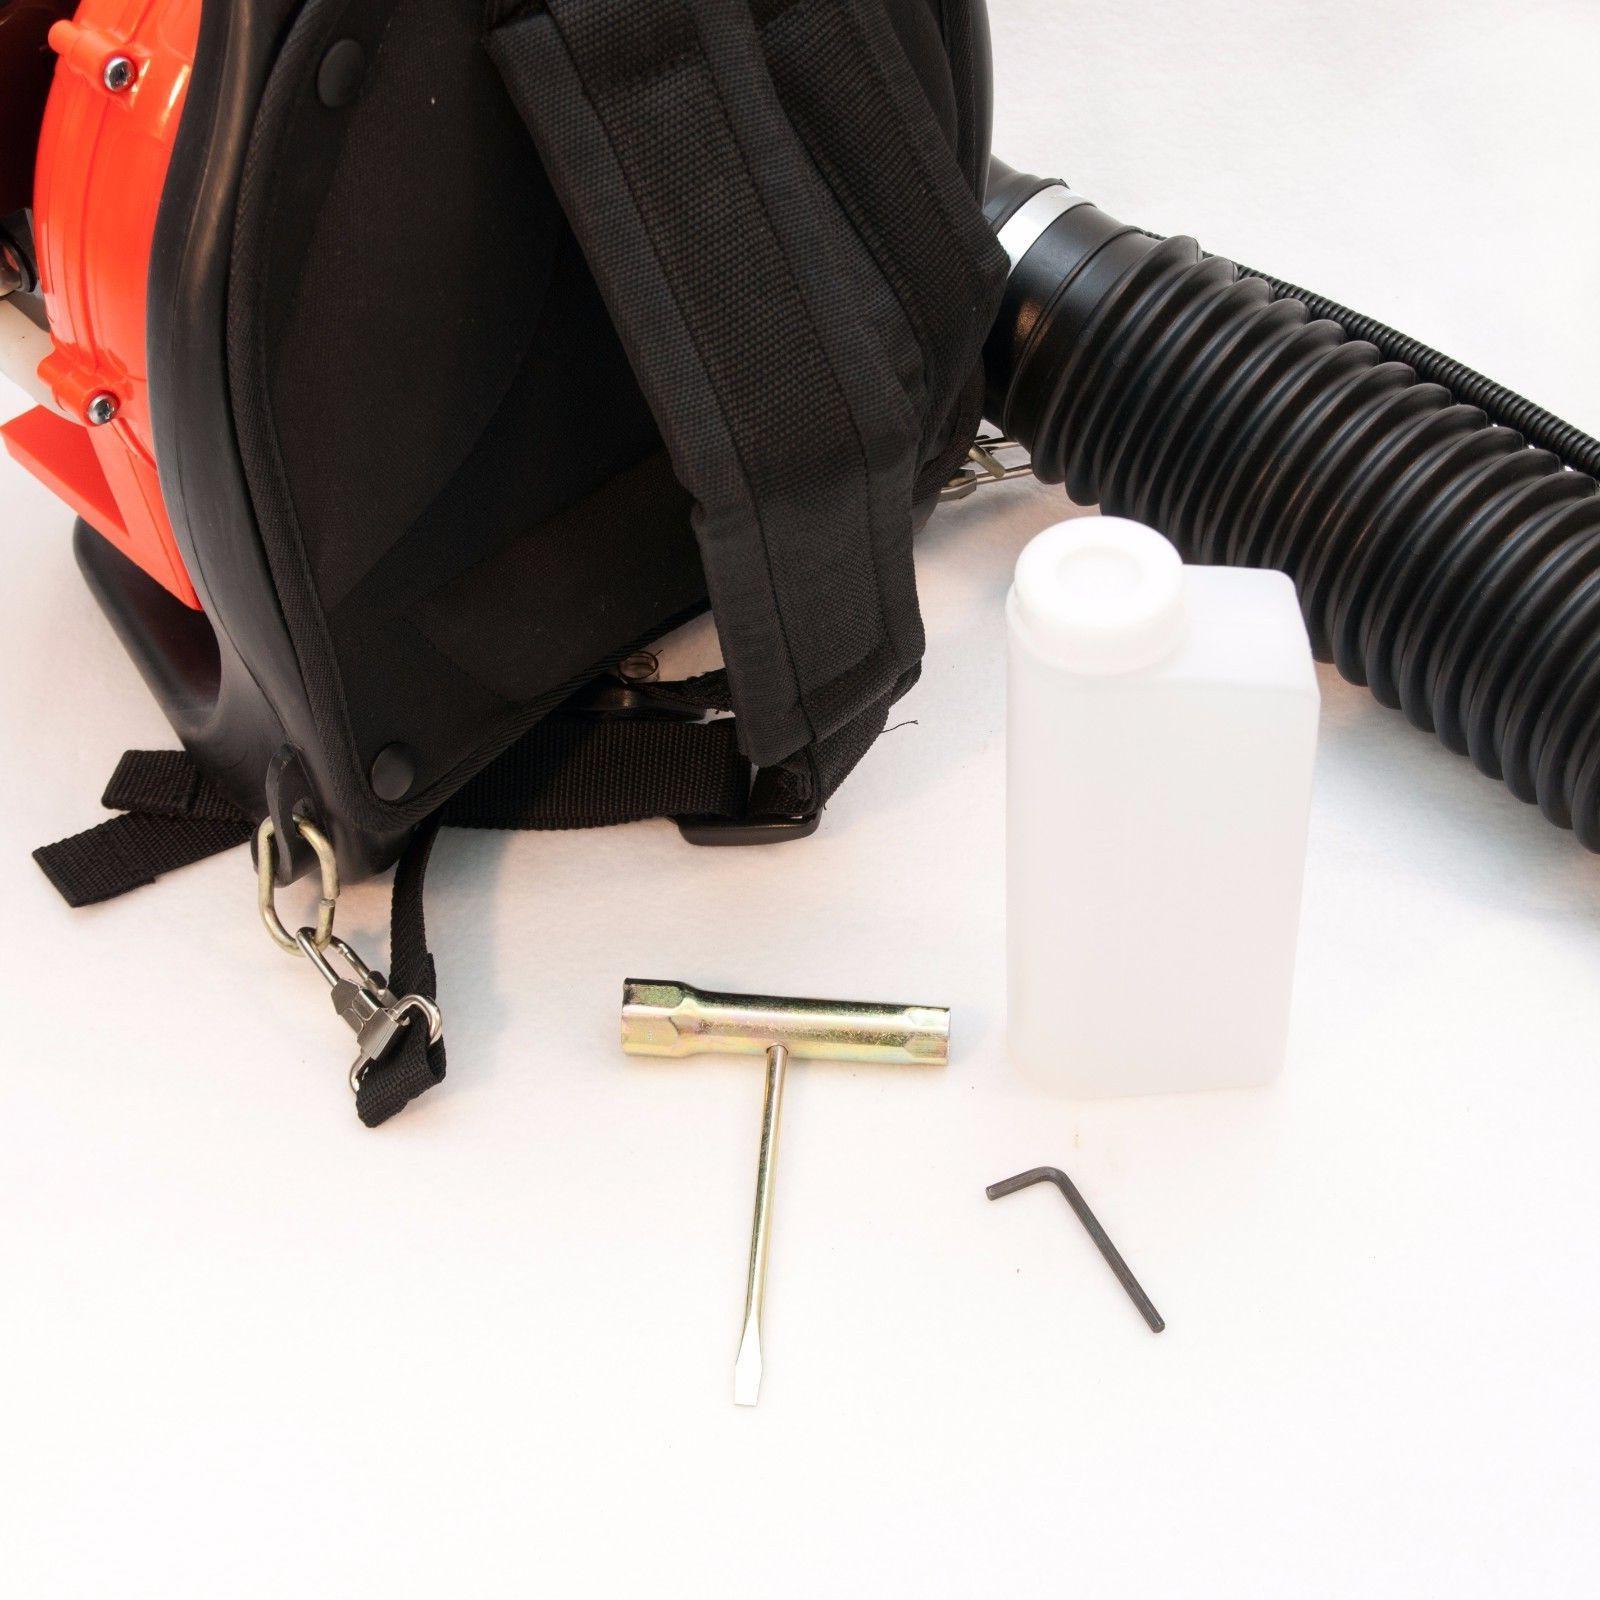 Back Pack Blower, 33cc Approved, Easy Starting 423 CFM